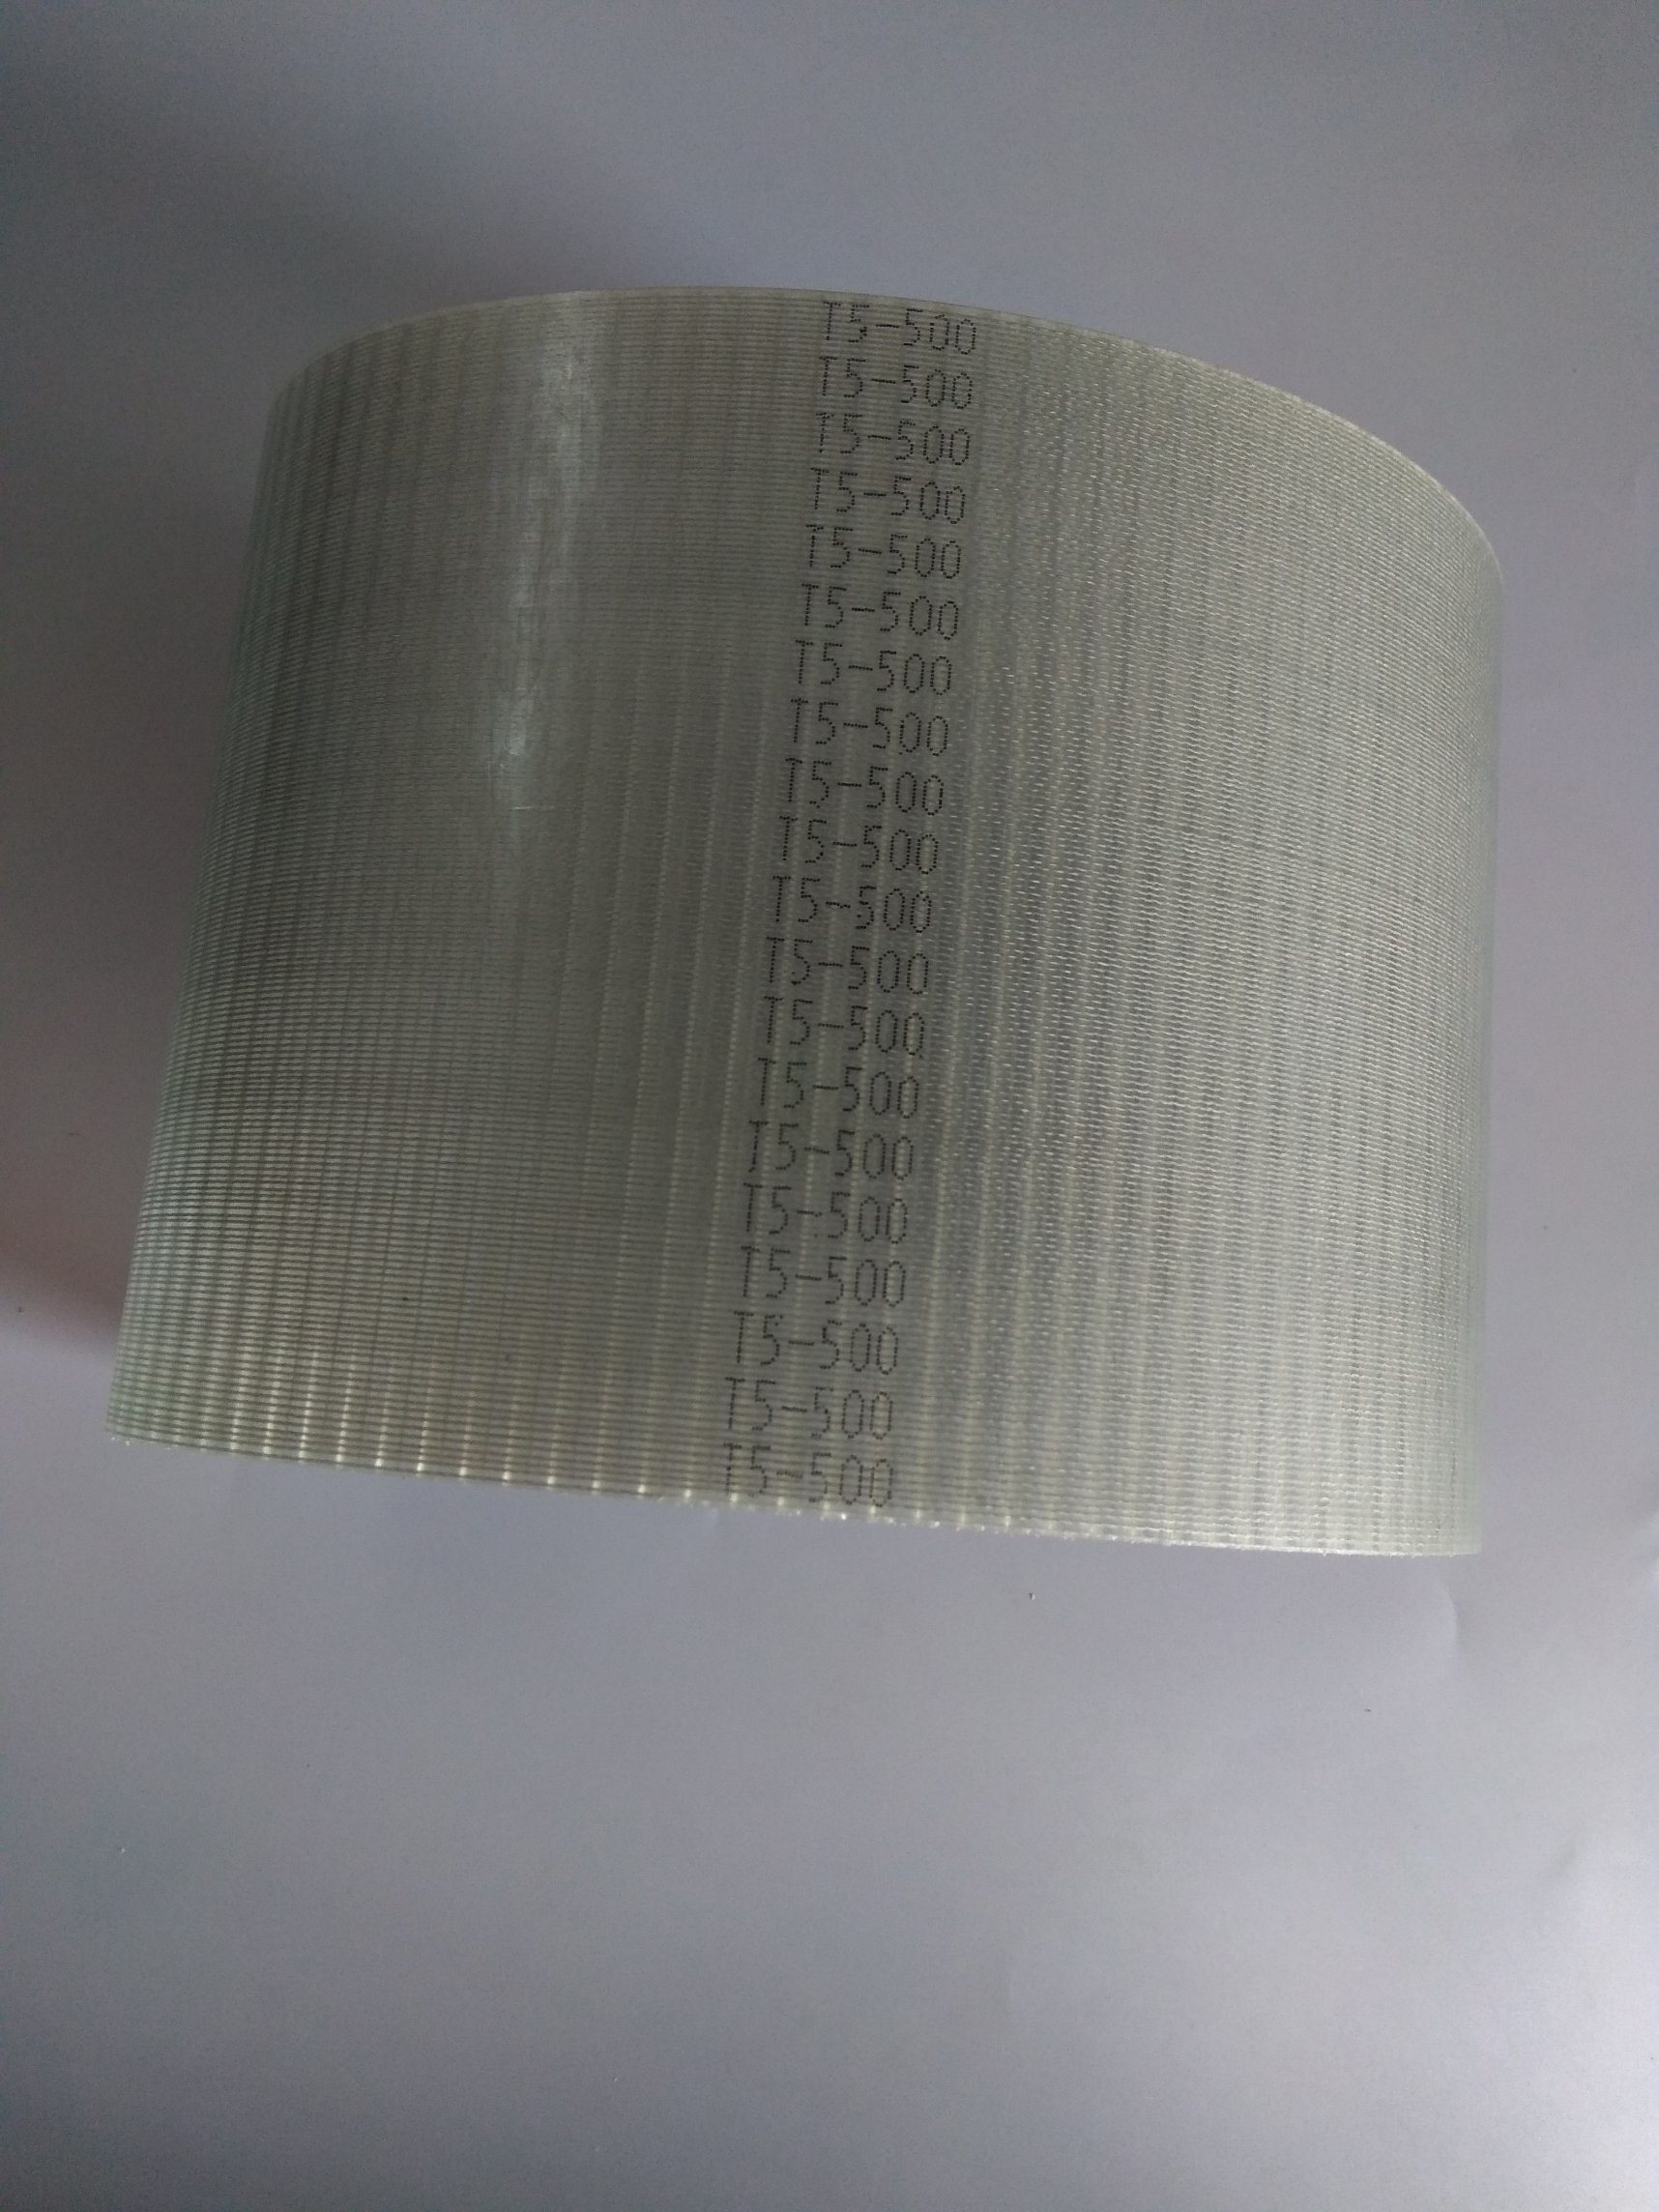 China Polyurethane Toothed Belt Timing Transmission T5 500